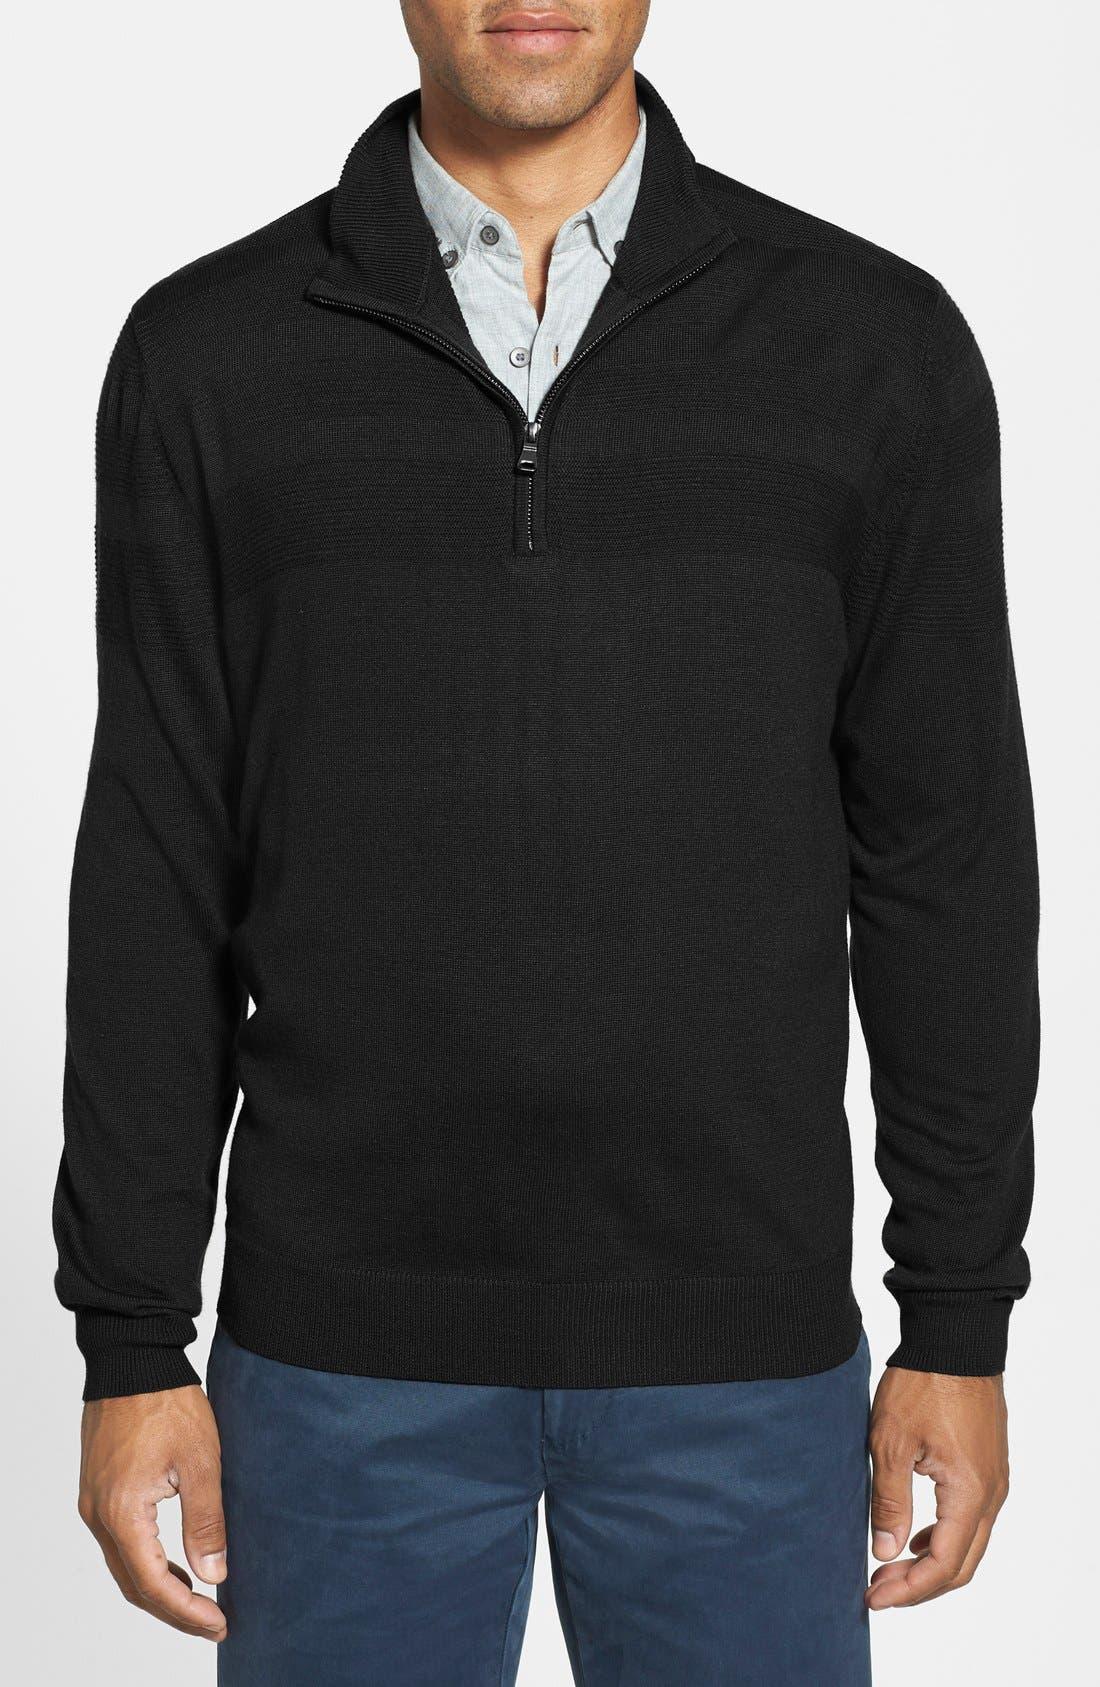 'Douglas' Merino Wool Blend Half Zip Sweater,                             Main thumbnail 1, color,                             001